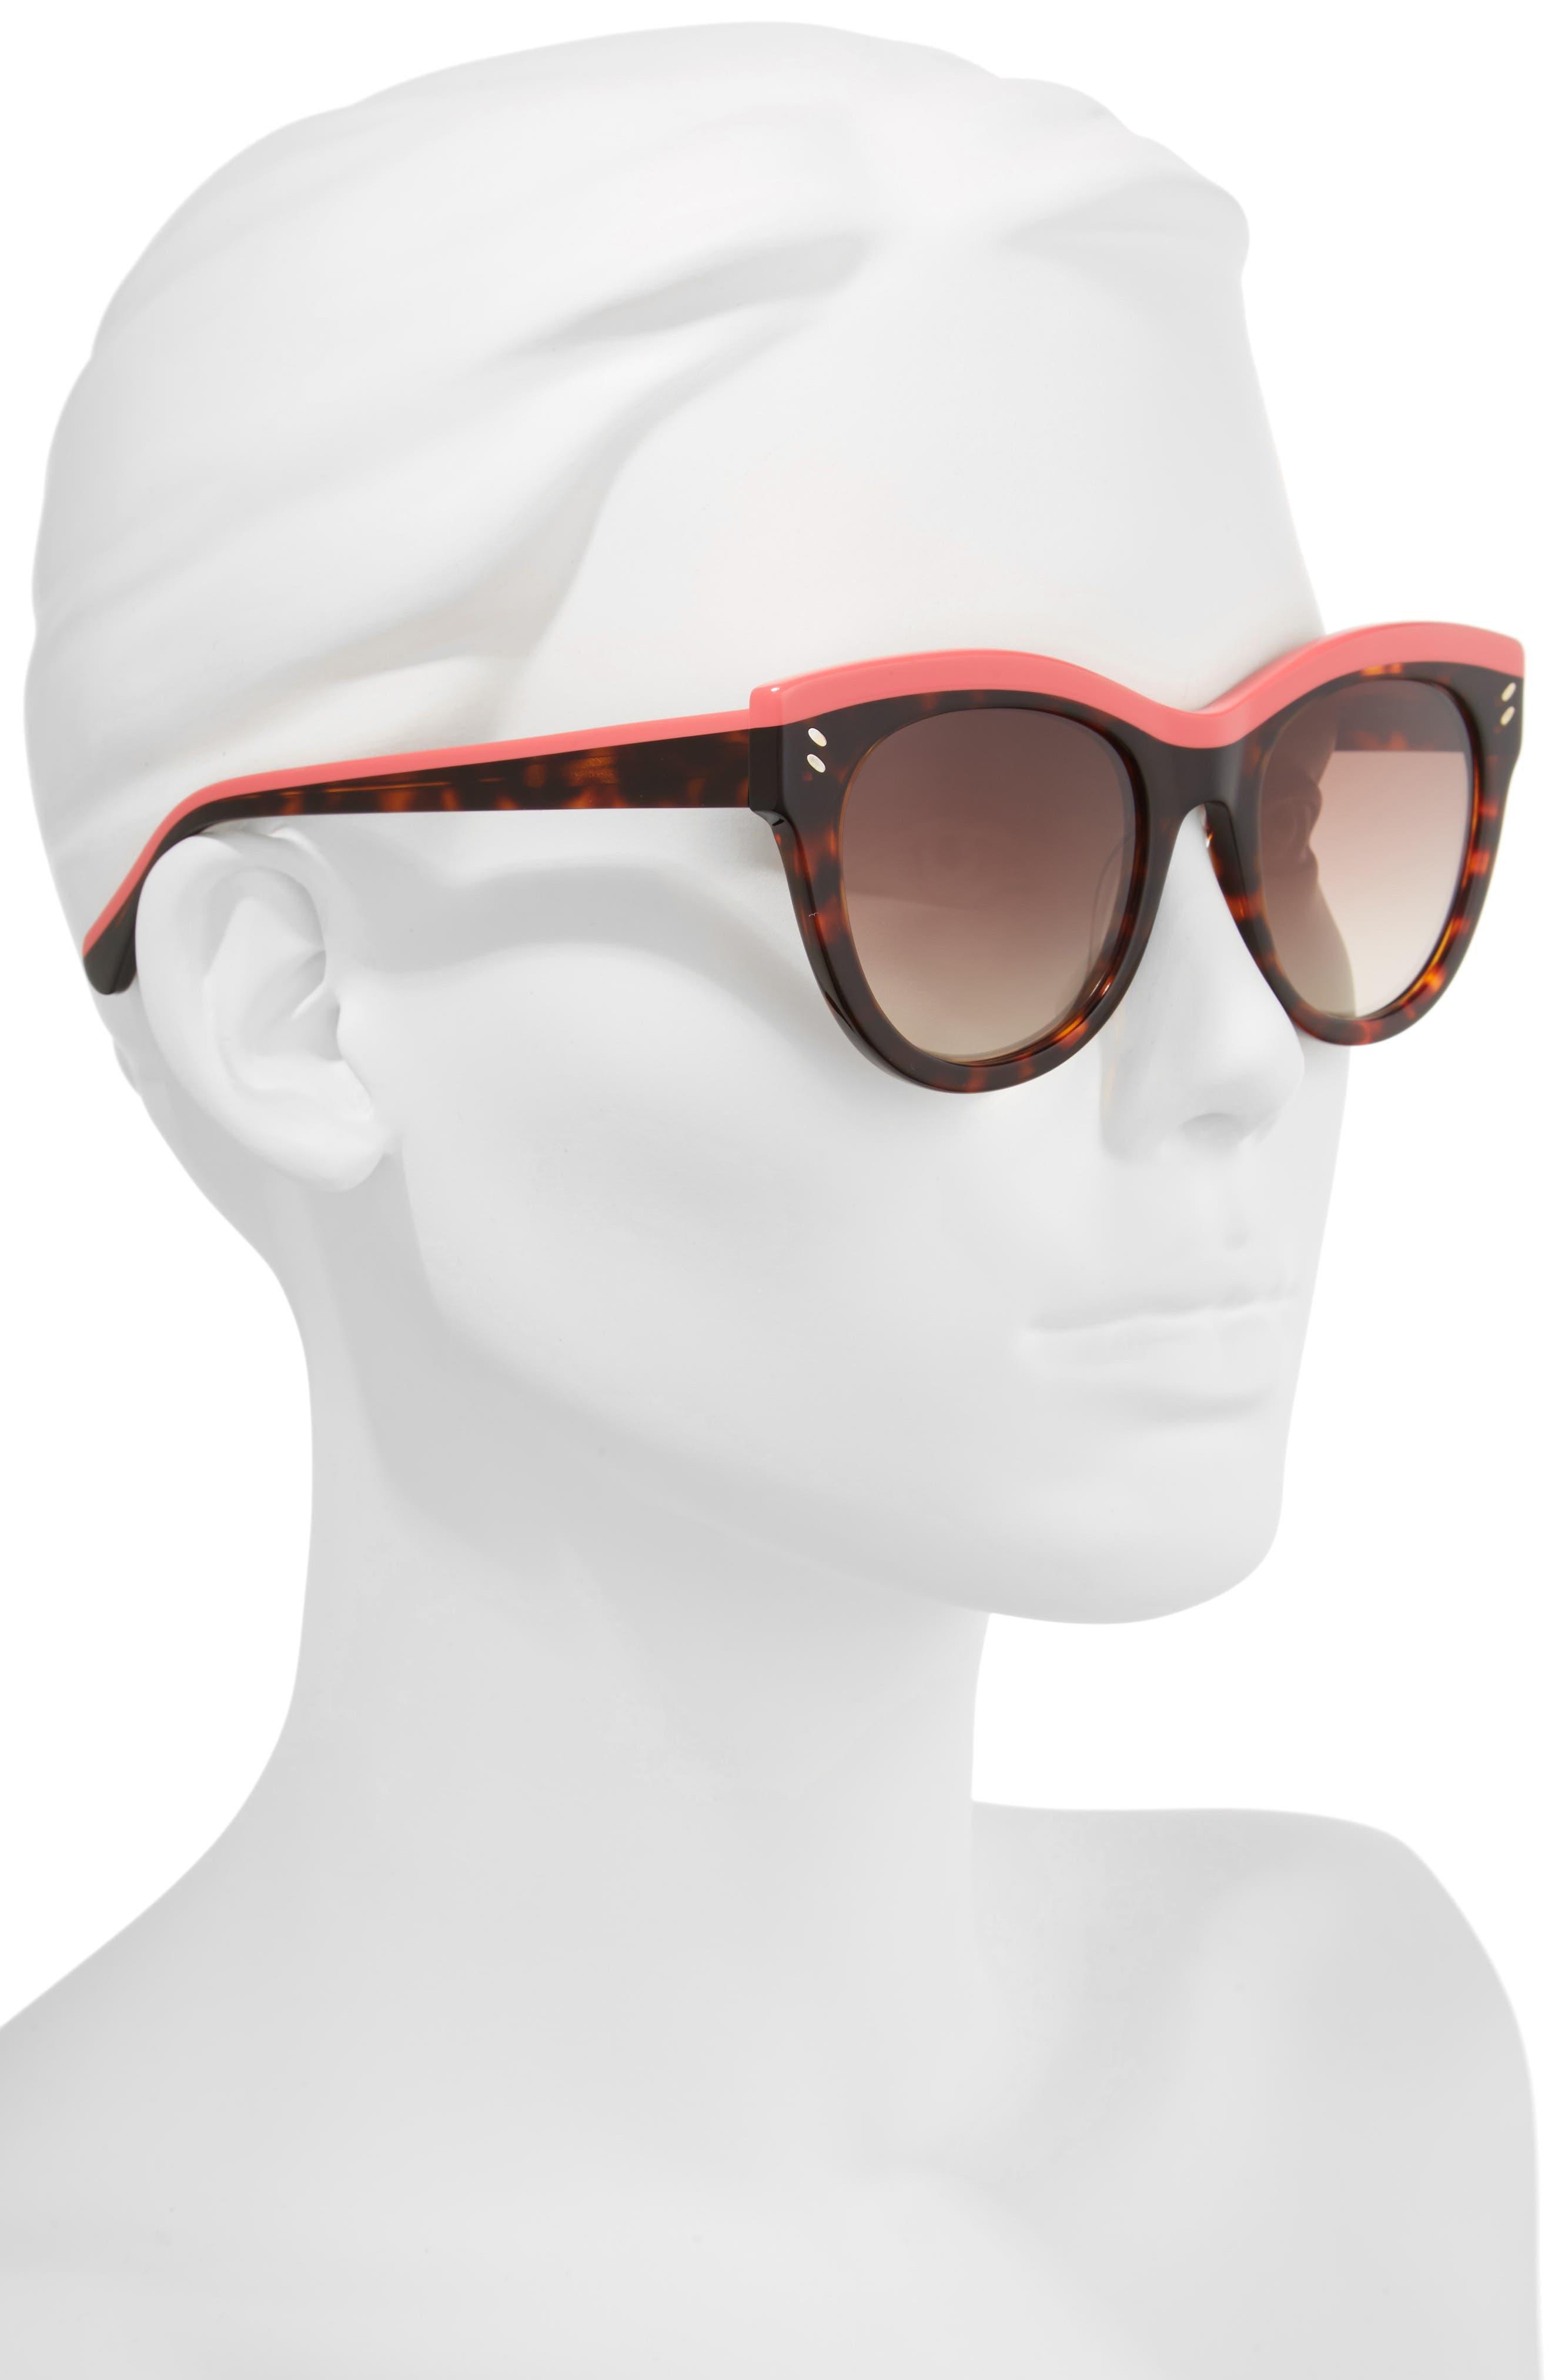 51mm Cat Eye Sunglasses,                             Alternate thumbnail 2, color,                             Pink/ Avana